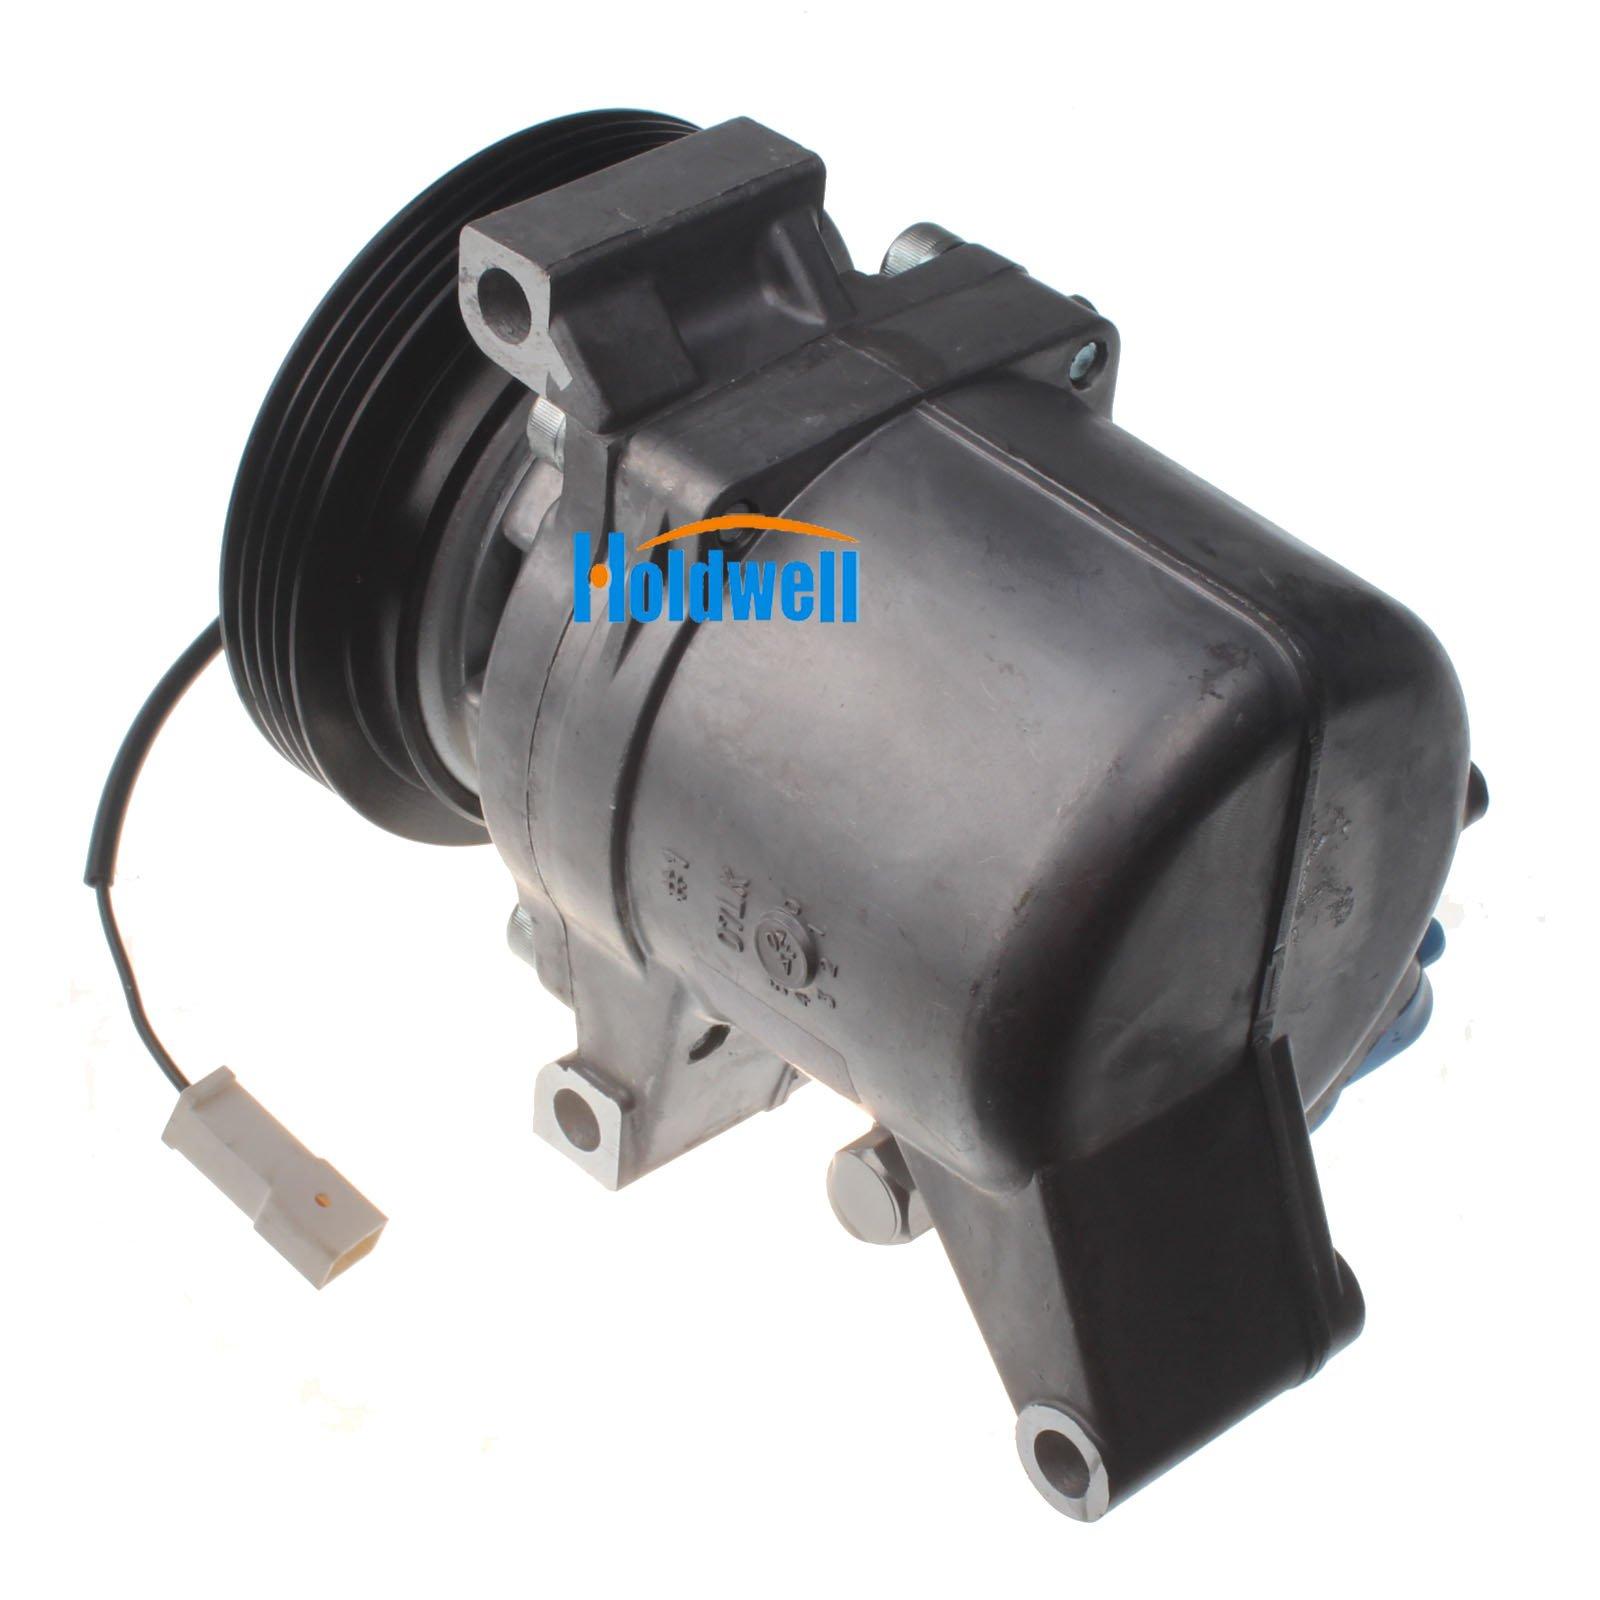 Holdwell Auto AC Compressor 95201-77GB2 9520177GB2 for Suzuki Jimny Seiko Seiki SS07LK10 by Holdwell (Image #6)